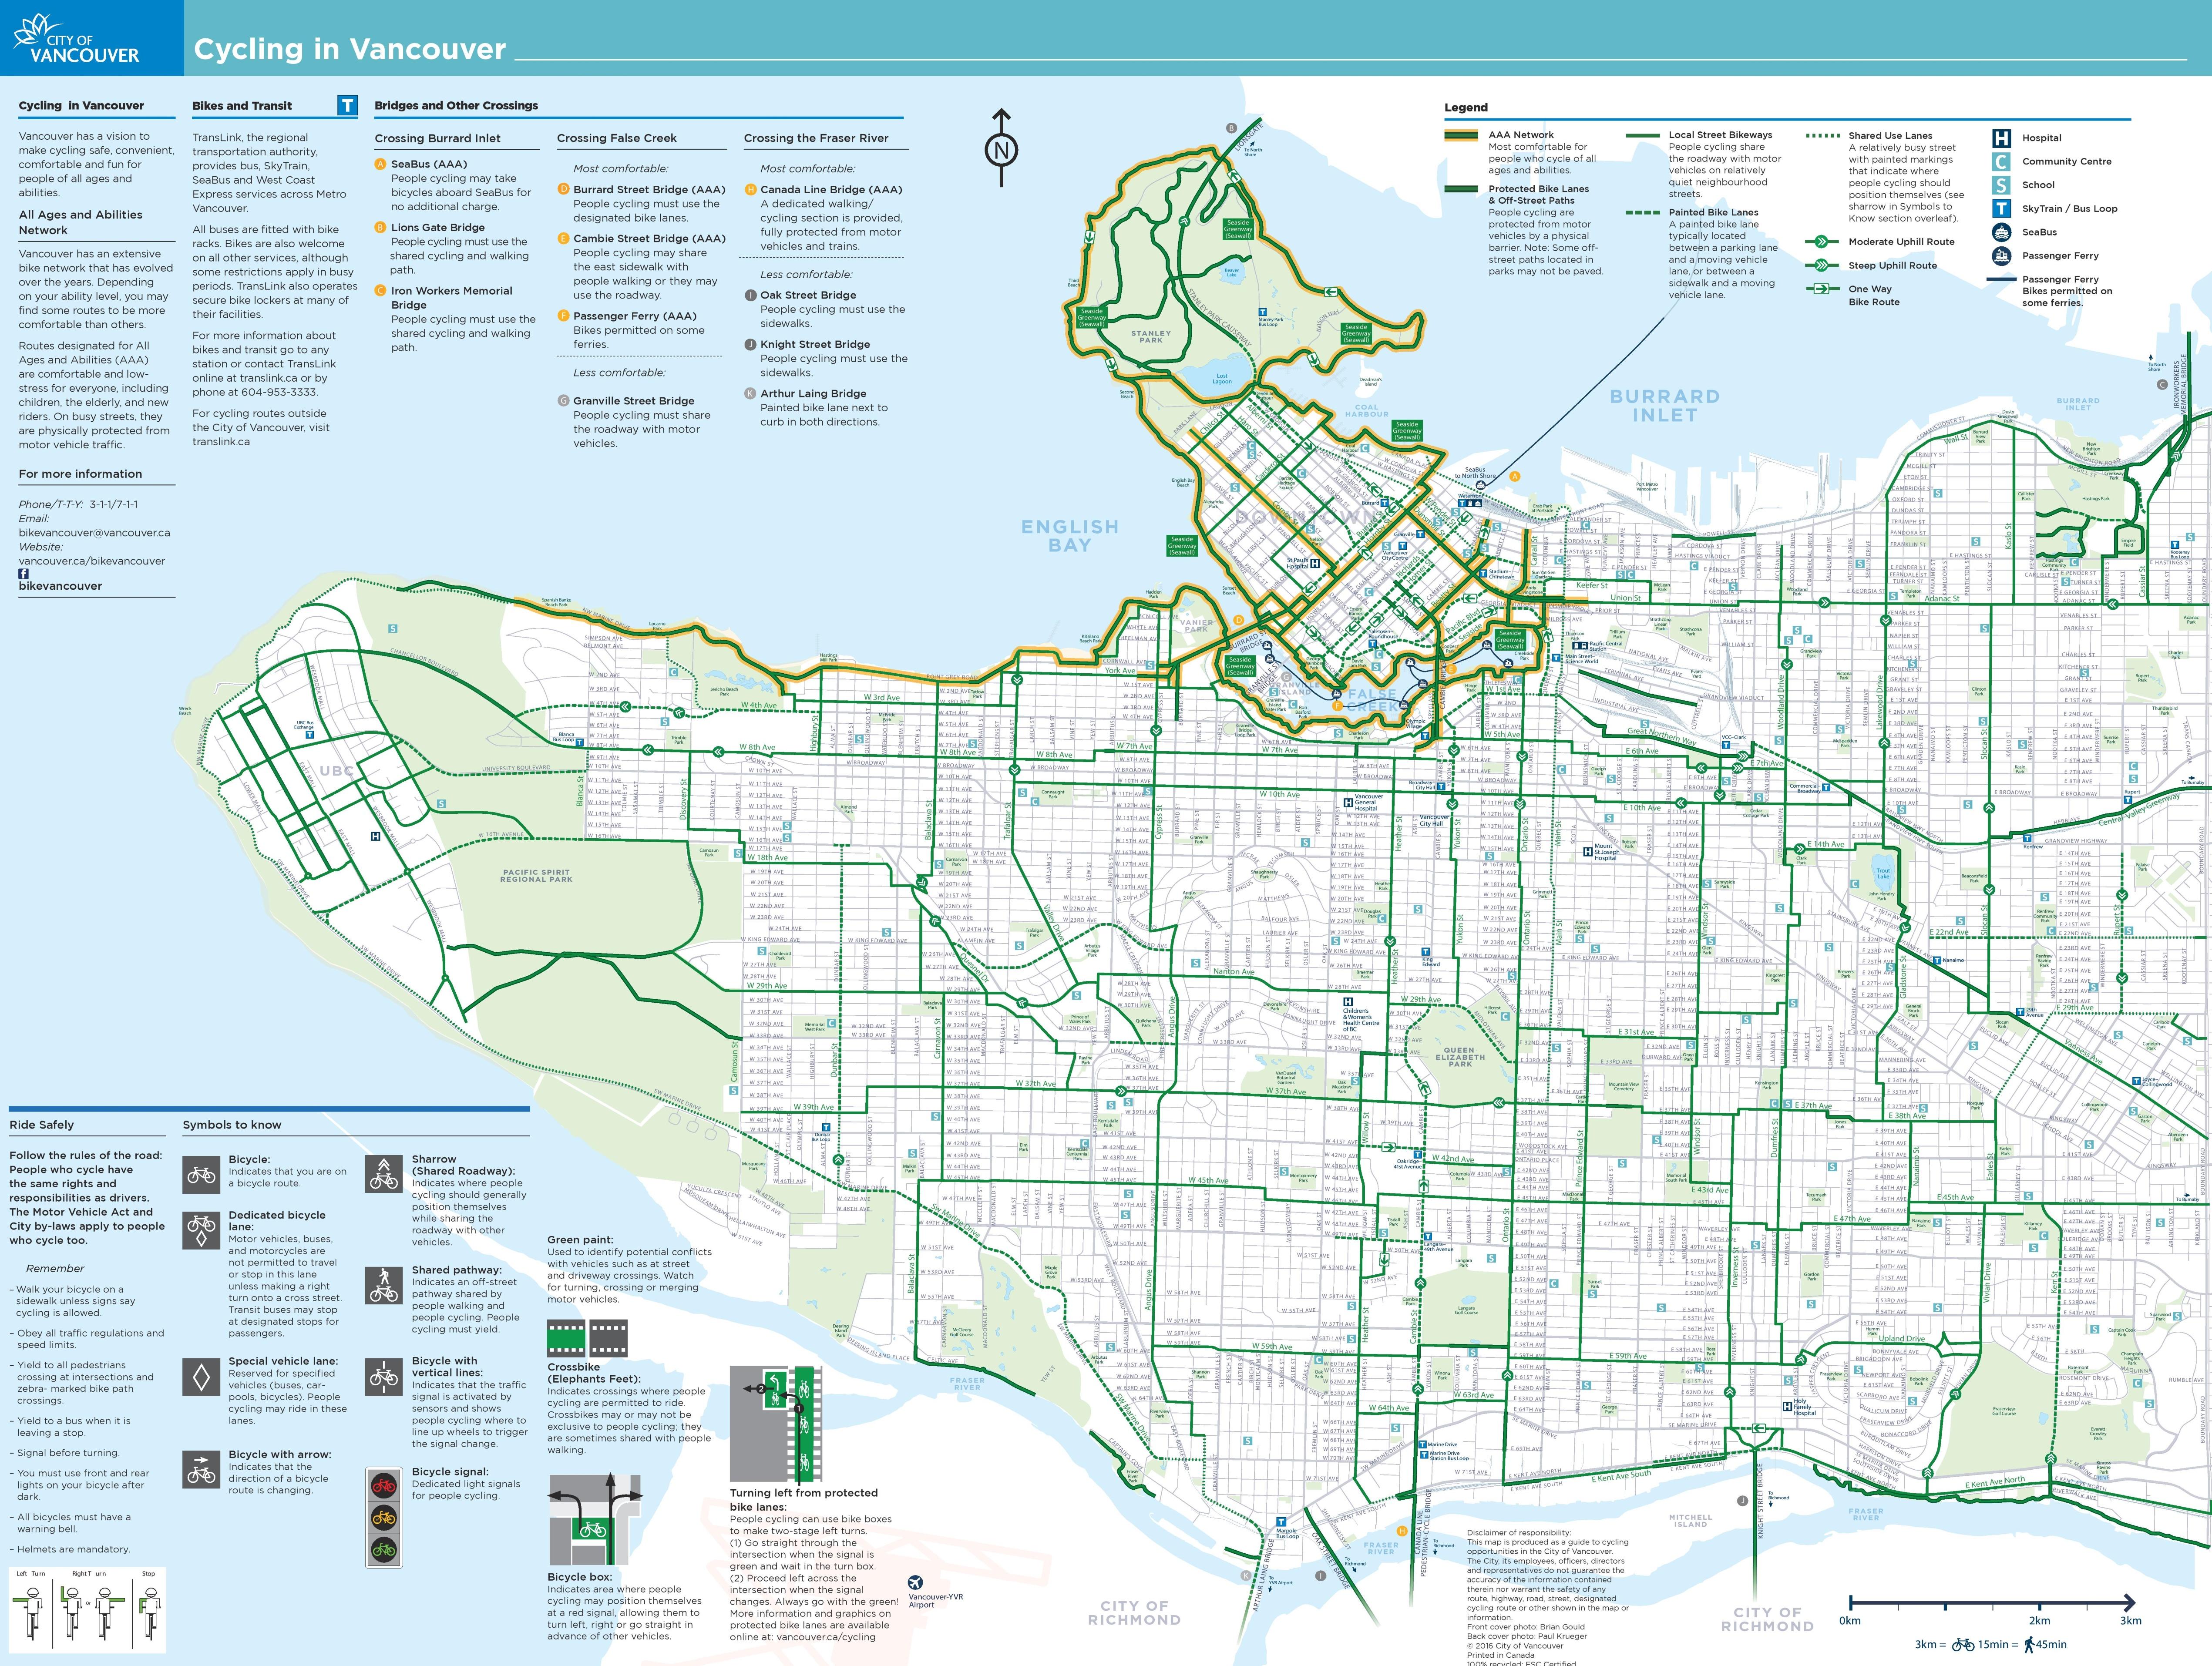 Vancouver Cycling Map Vancouver cycling map